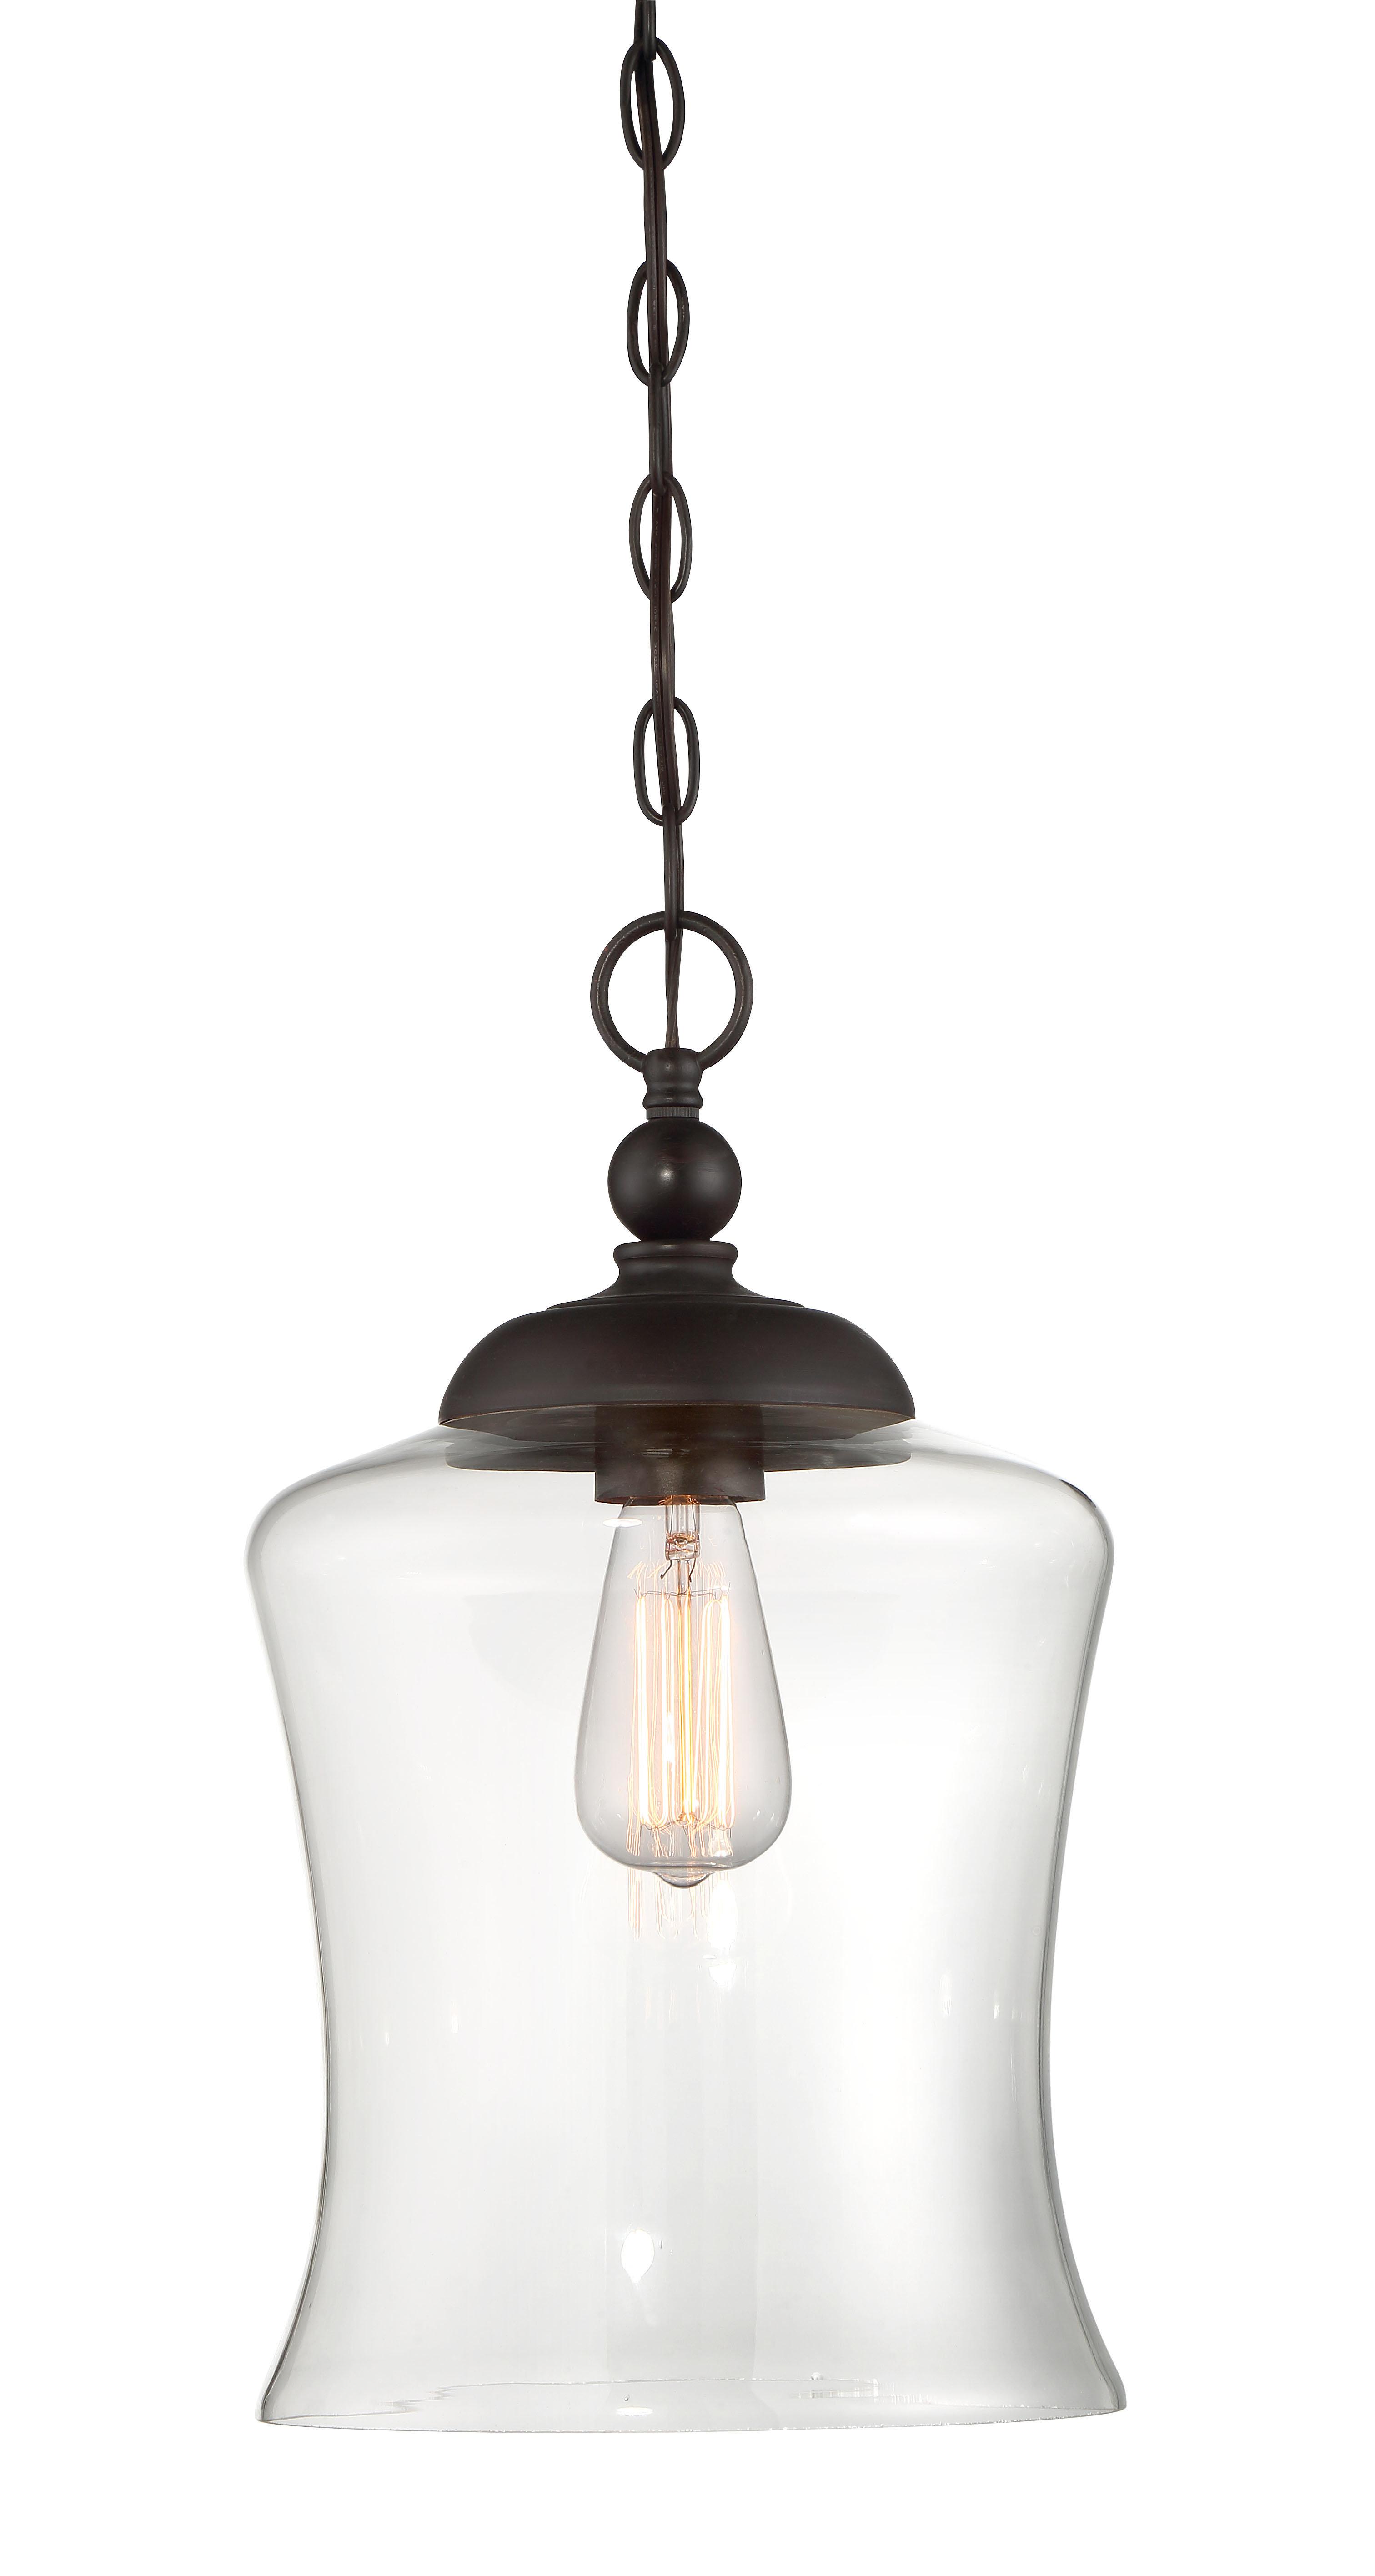 Wentzville 1-Light Single Bell Pendant in Conard 1-Light Single Teardrop Pendants (Image 28 of 30)